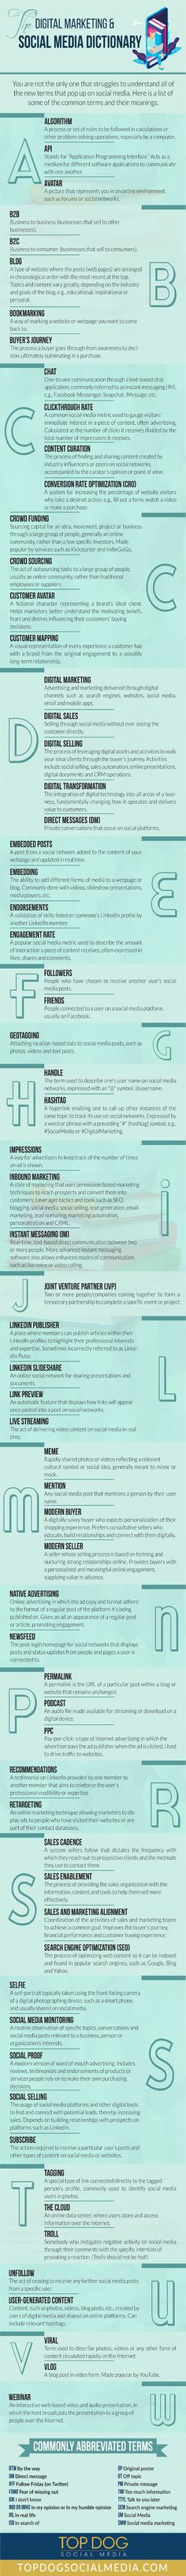 The A-Z Digital Marketing & Social Media Dictionary